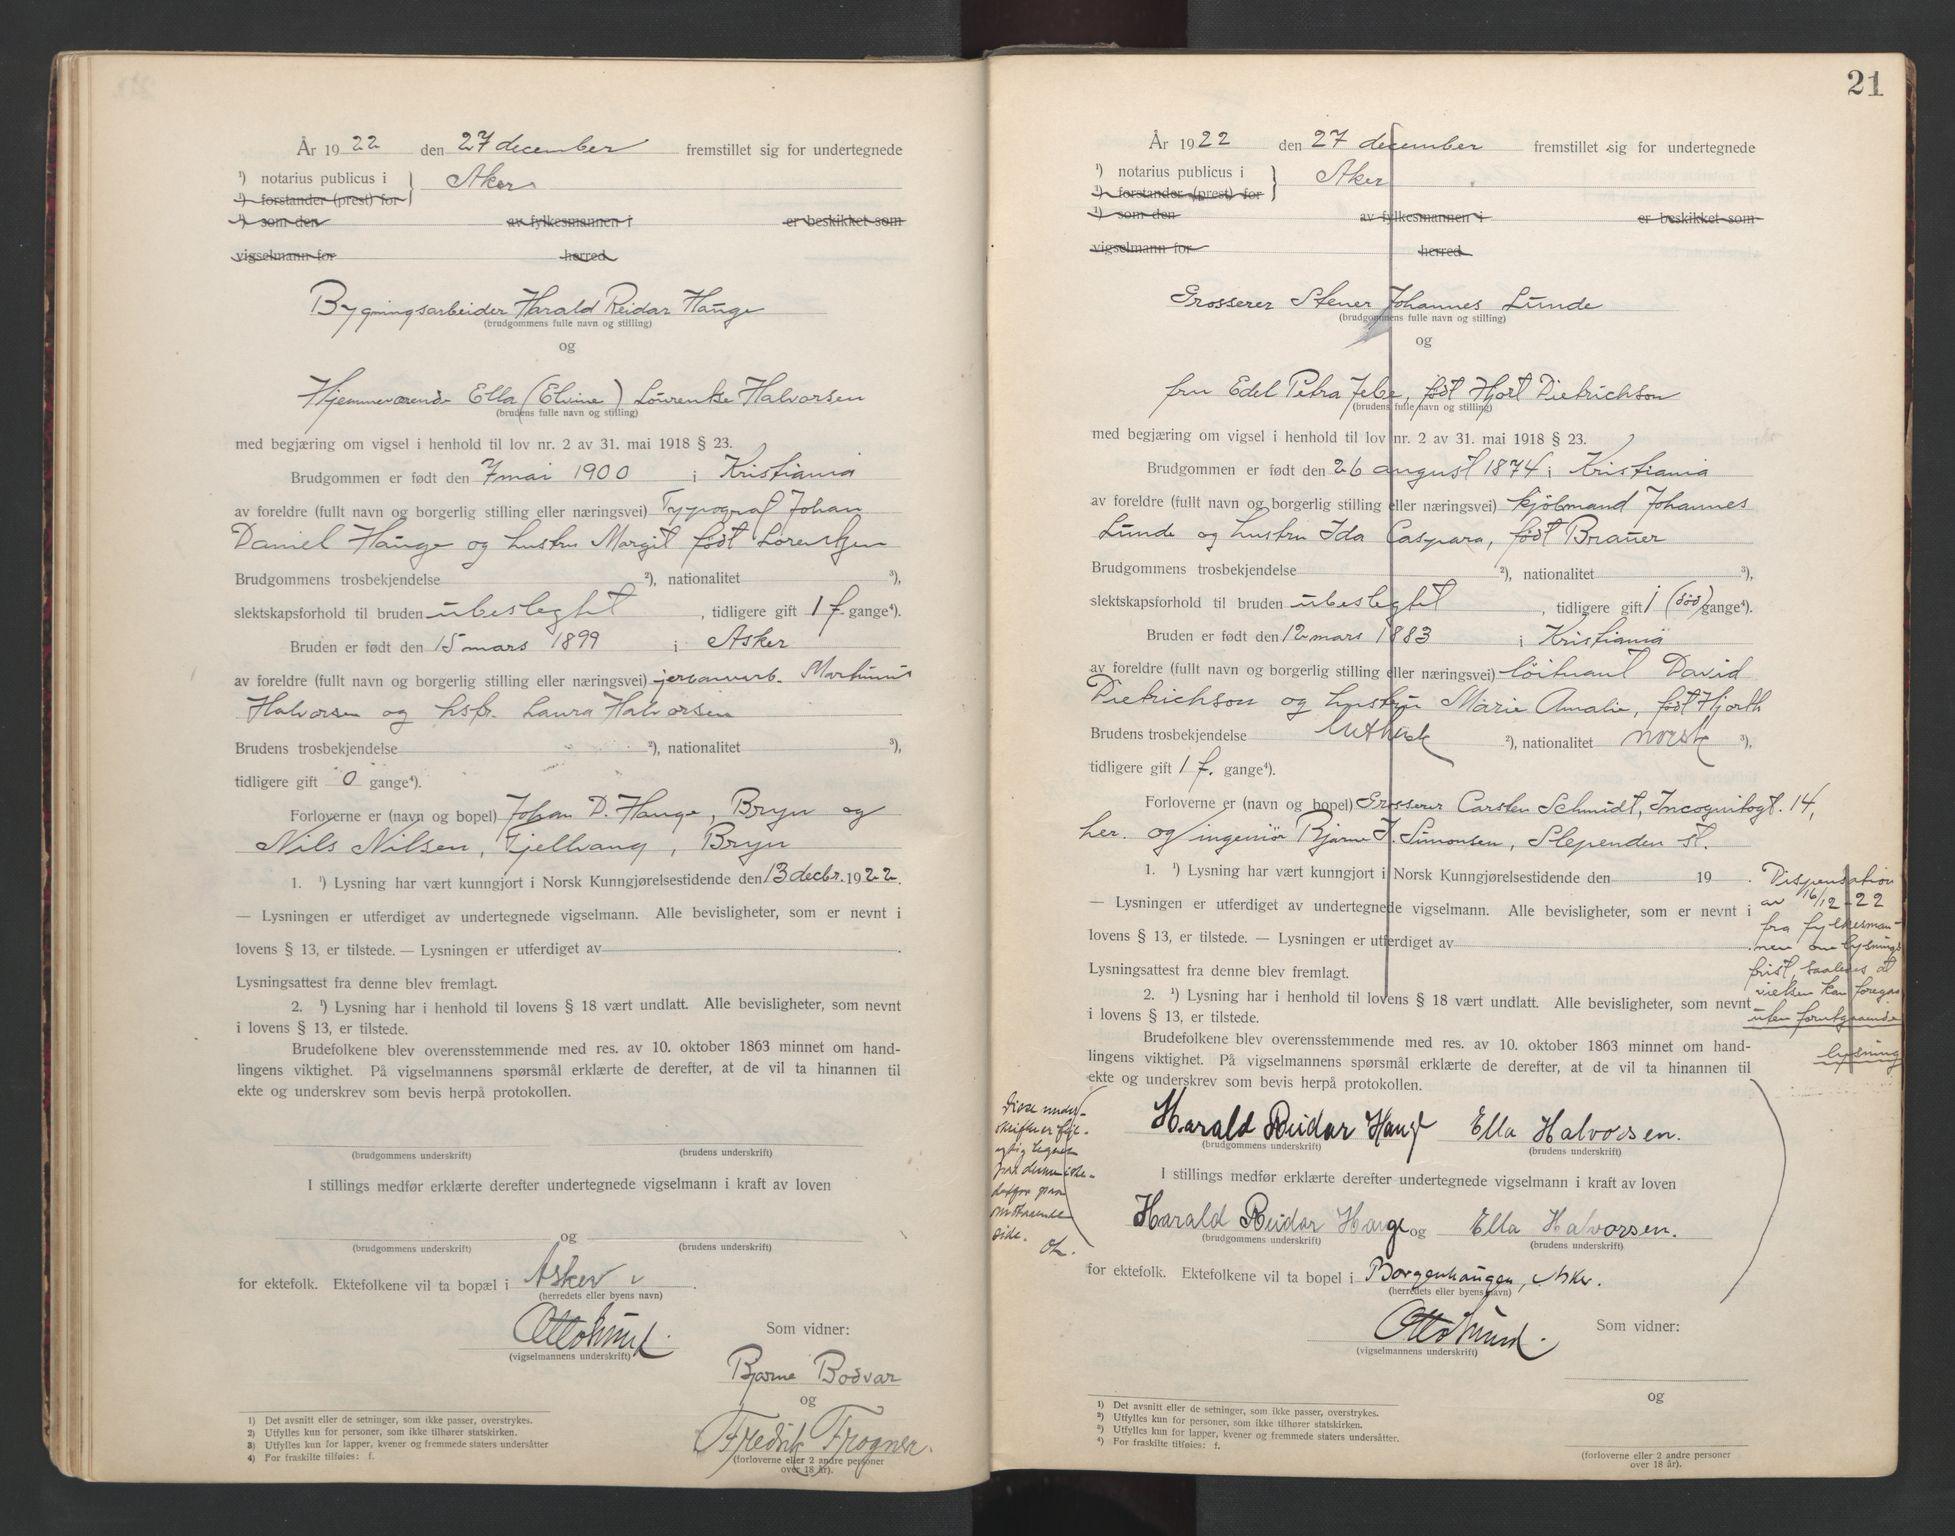 SAO, Aker sorenskriveri, L/Lc/Lcb/L0002: Vigselprotokoll, 1922-1924, s. 21